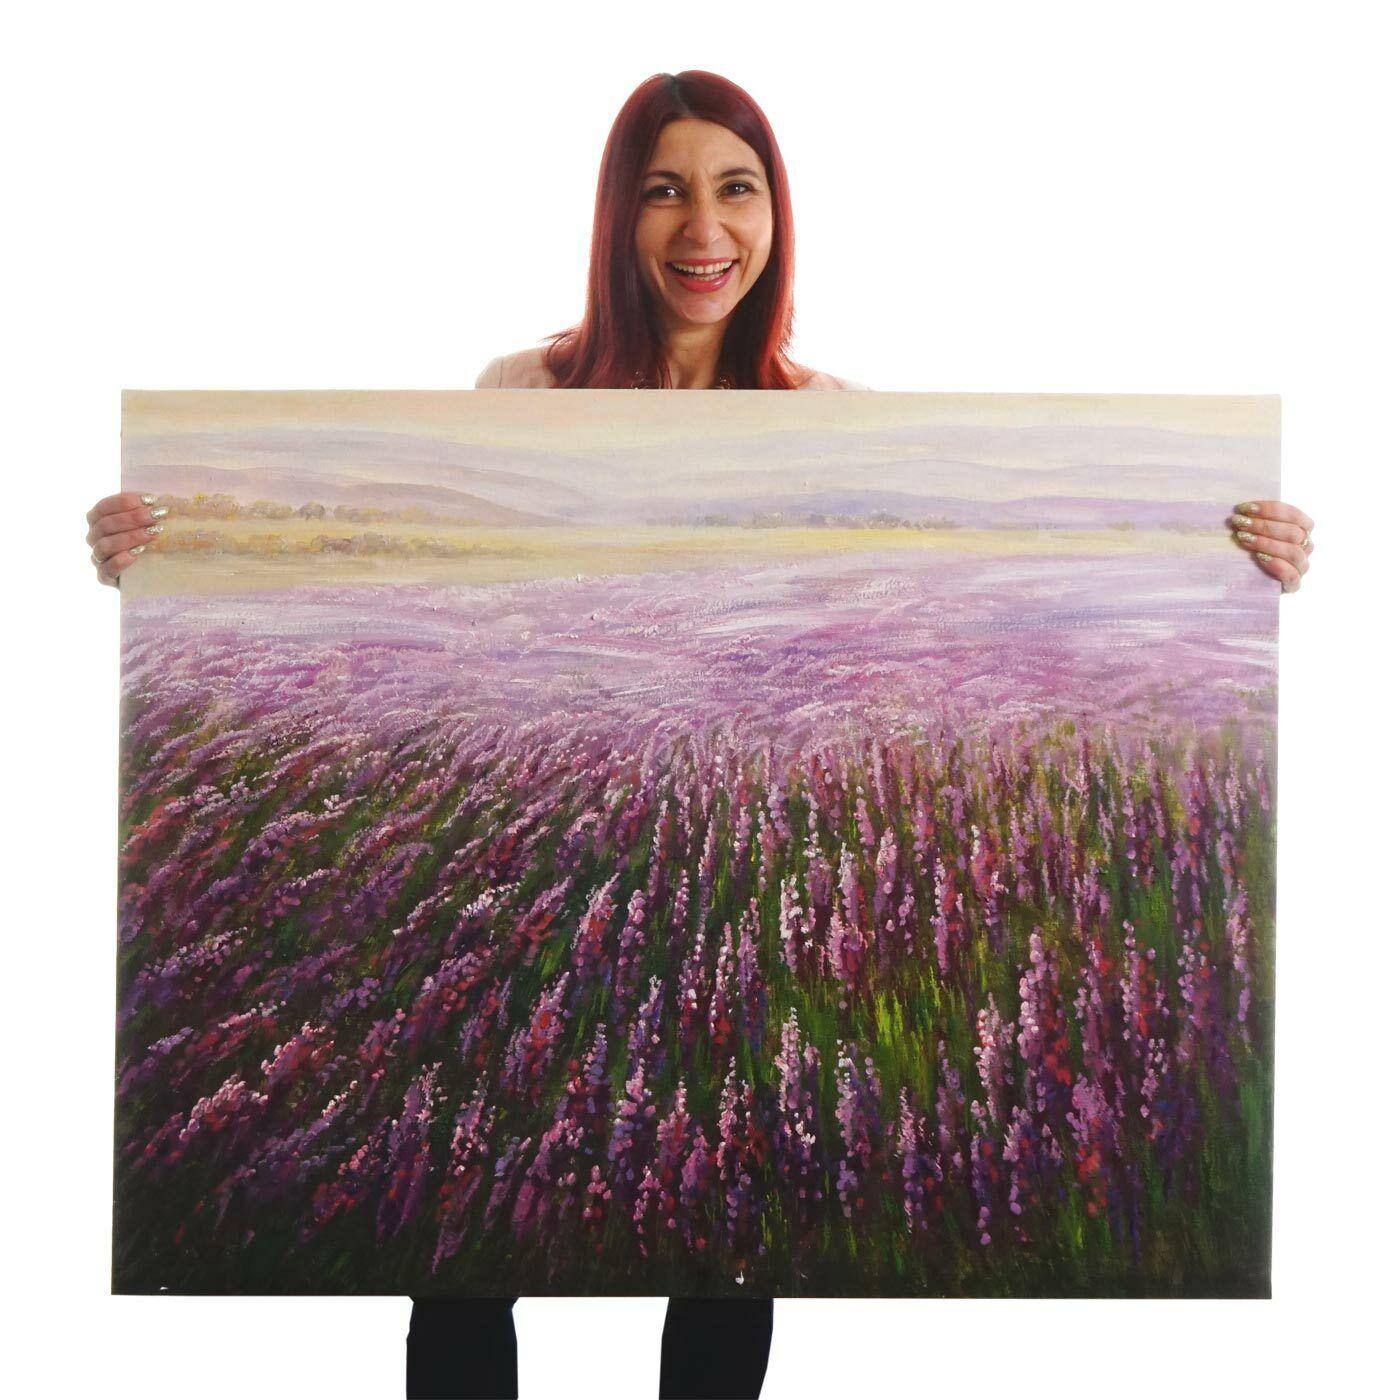 Ölgemälde Blaumenfeld, 100x80cm, 100% handgemaltes Wandbild Gemälde XL